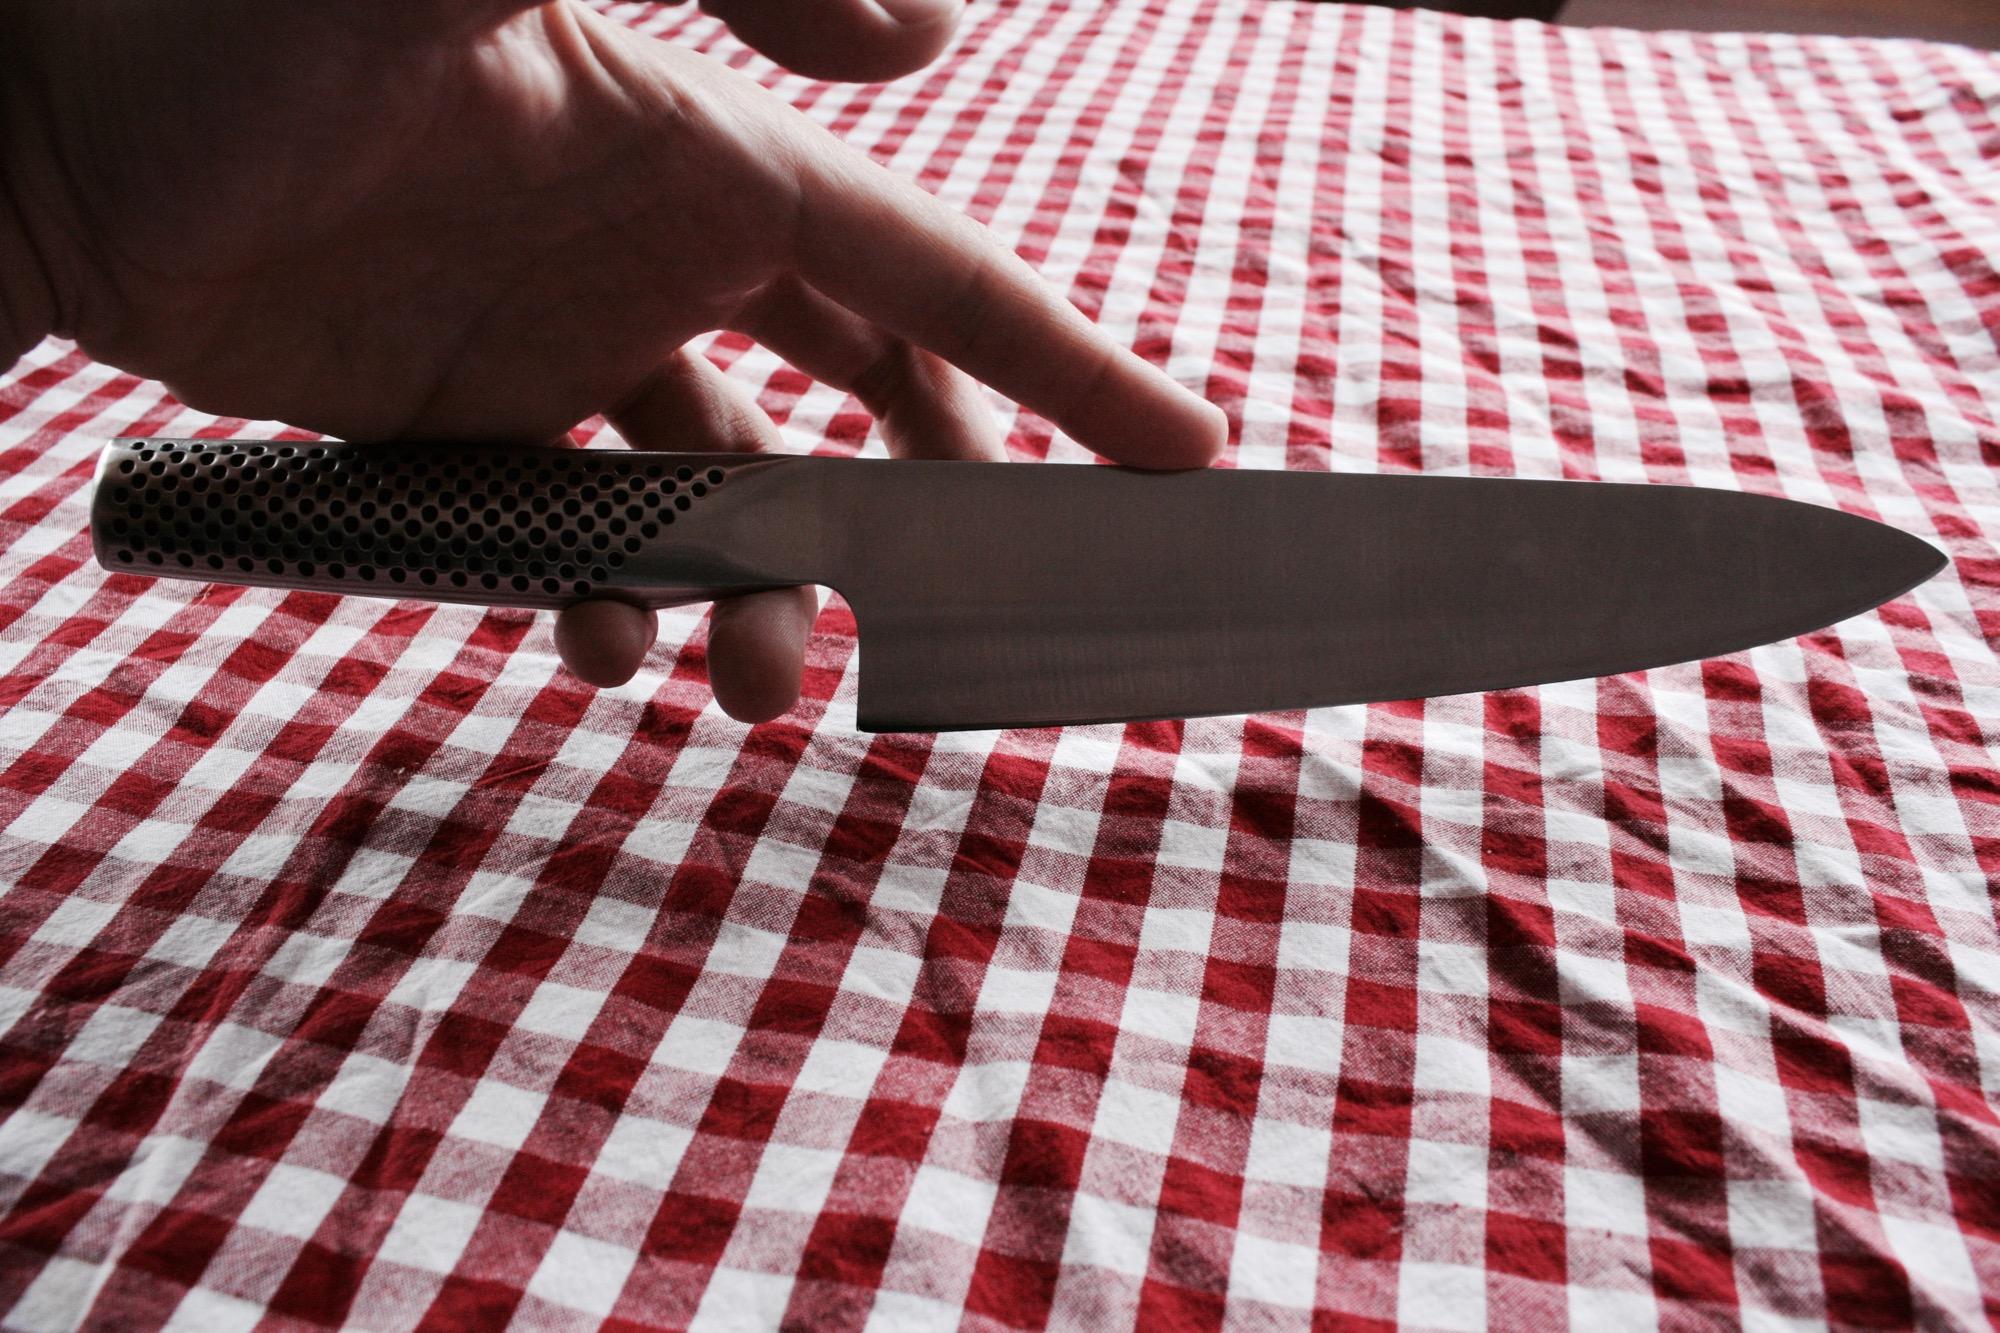 chefs-knife-6